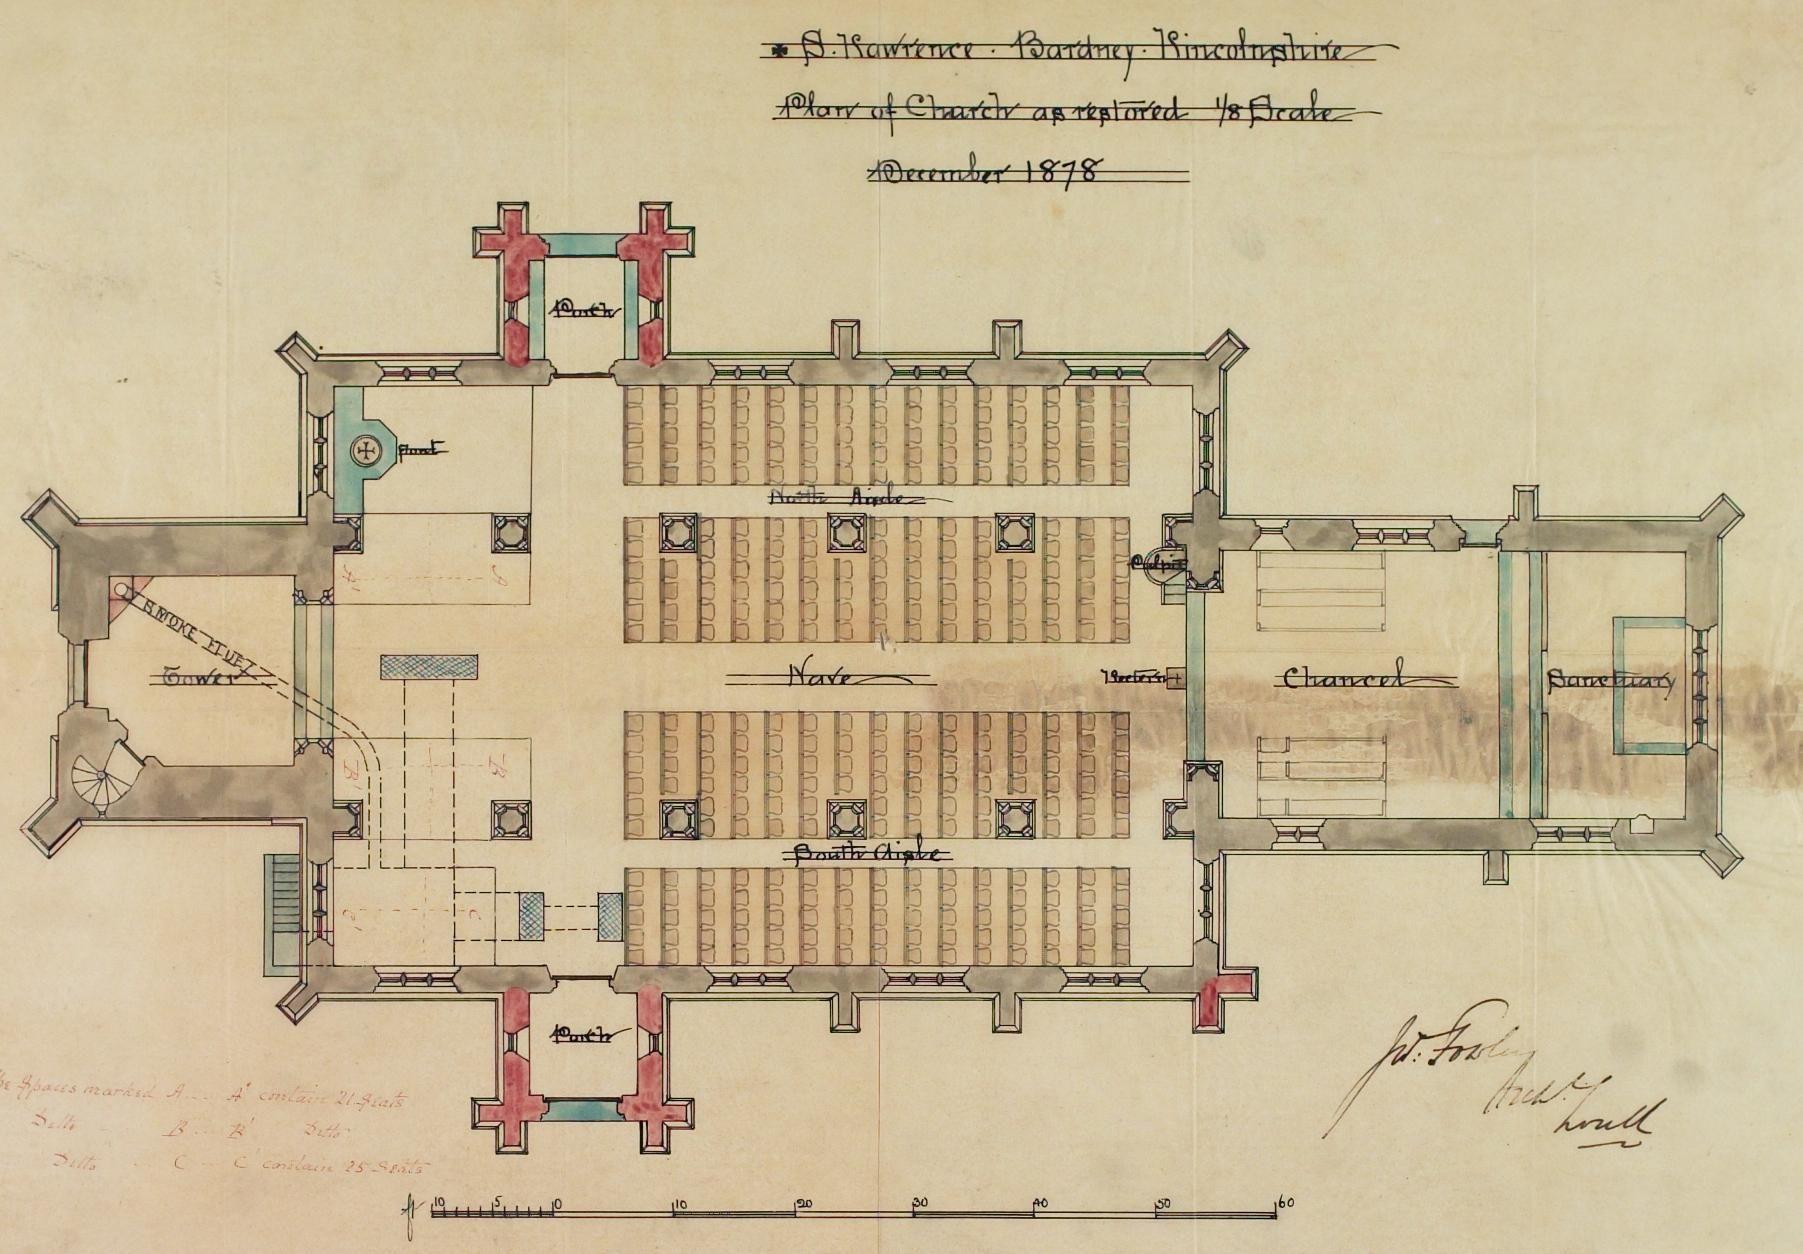 small churches of england 1878 bardney church plan churches of